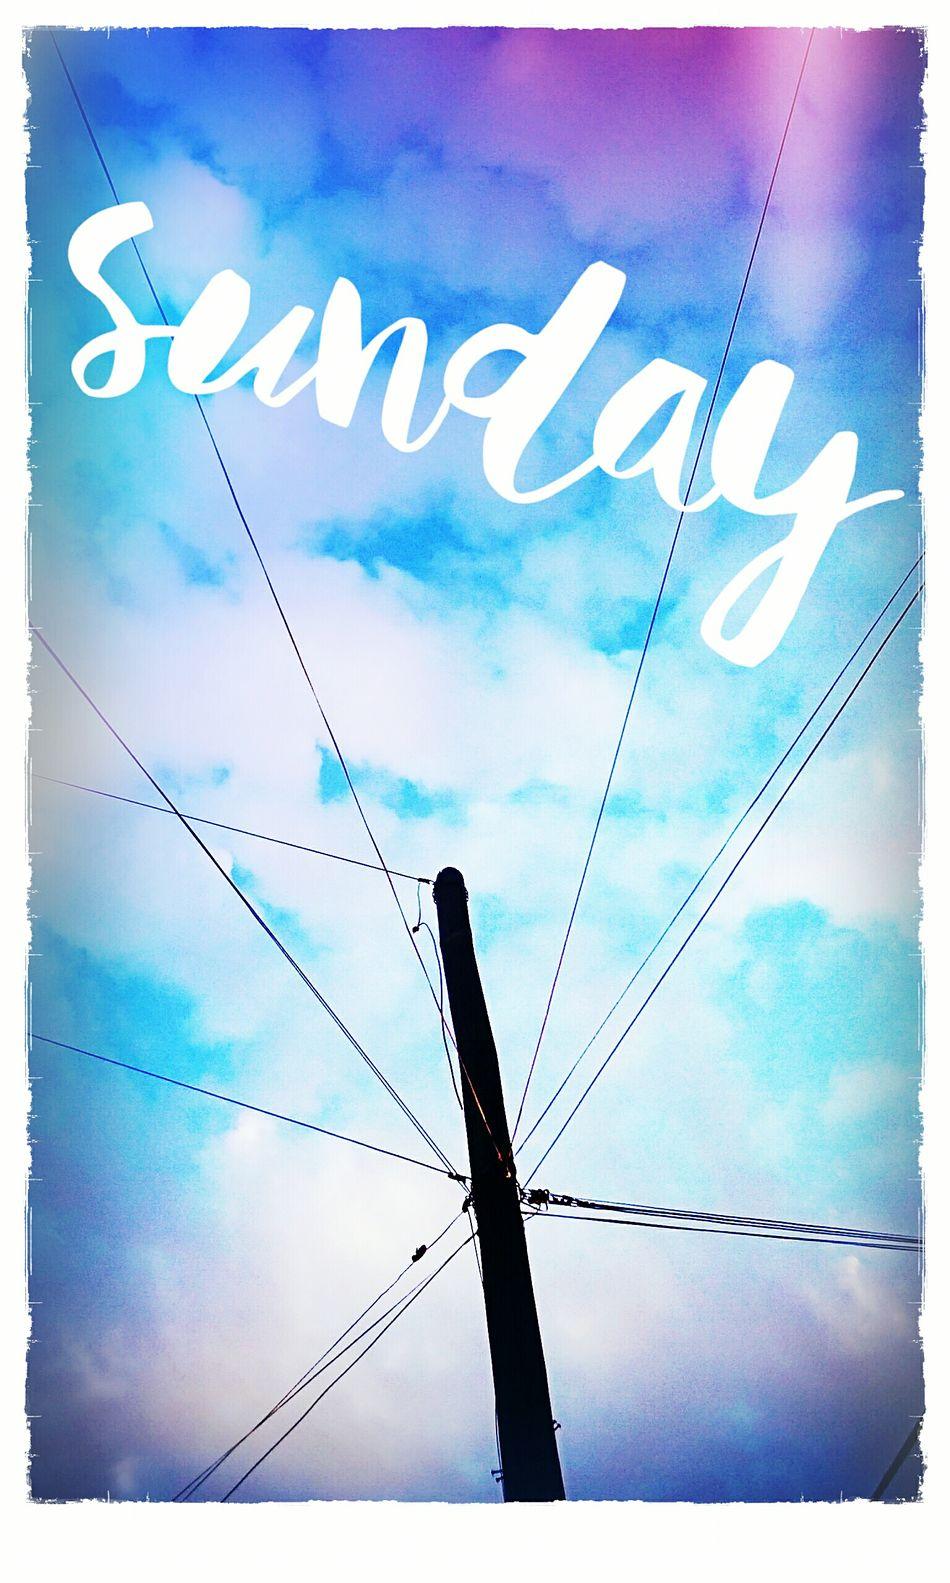 Data Text Communication Technology No People Cloud - Sky Sky Internet Outdoors Close-up Day Sunday Sundaymorning Filterphotography Filters